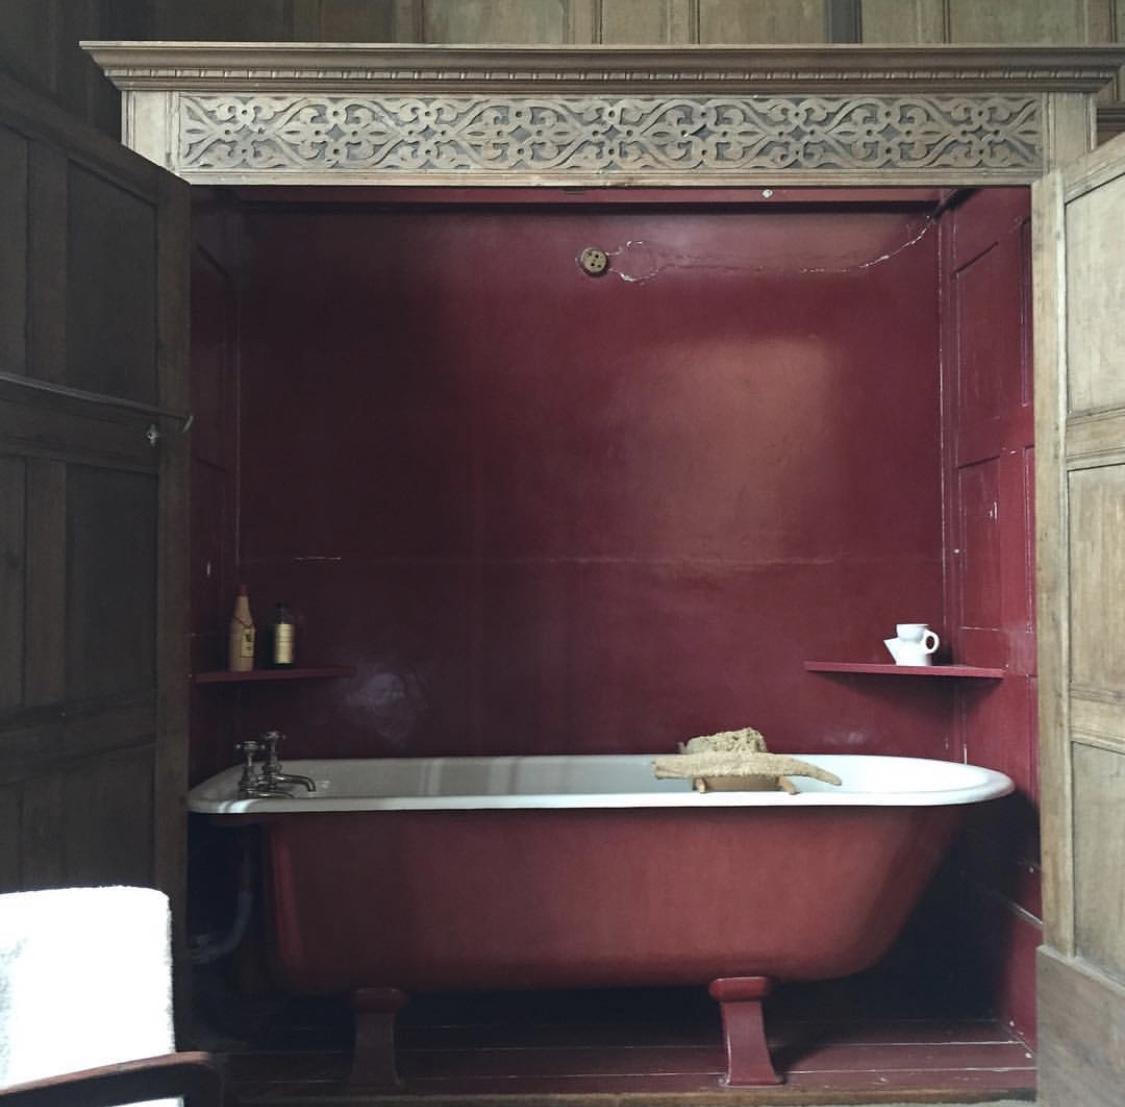 Bathroom at Montacute house